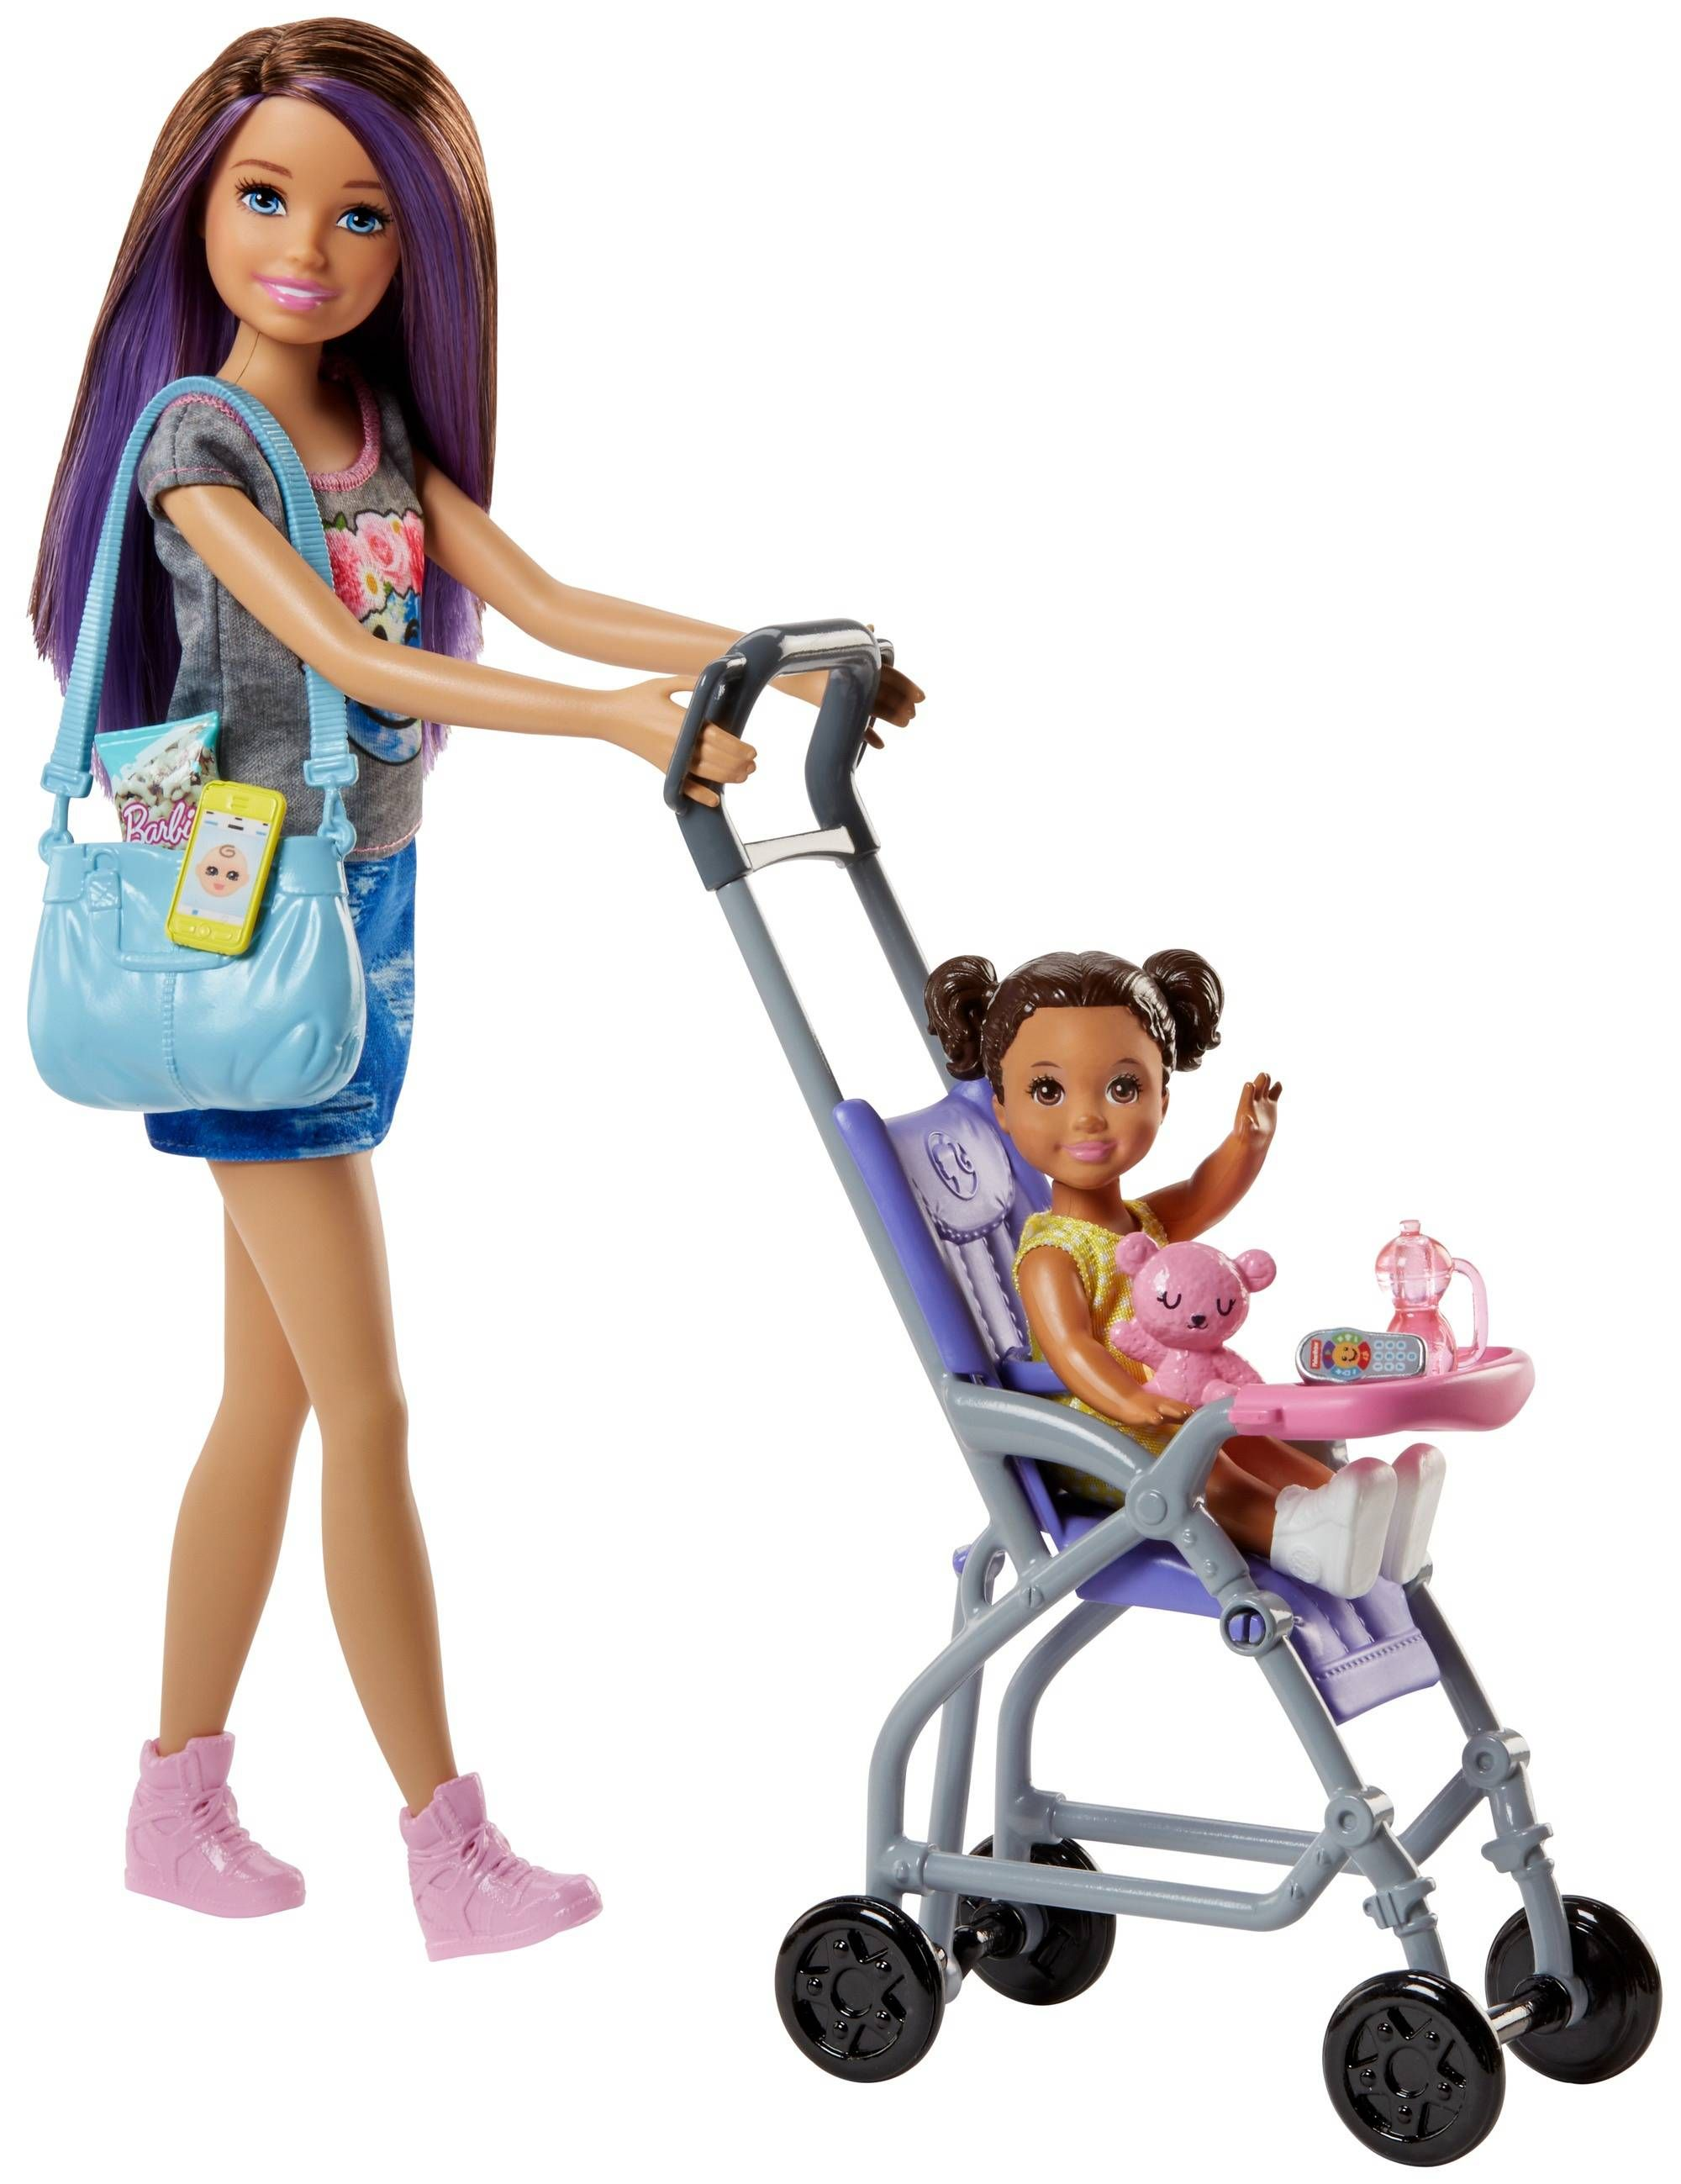 Игрален комплект Mattel Barbie - Детегледачка, асортимент - 10